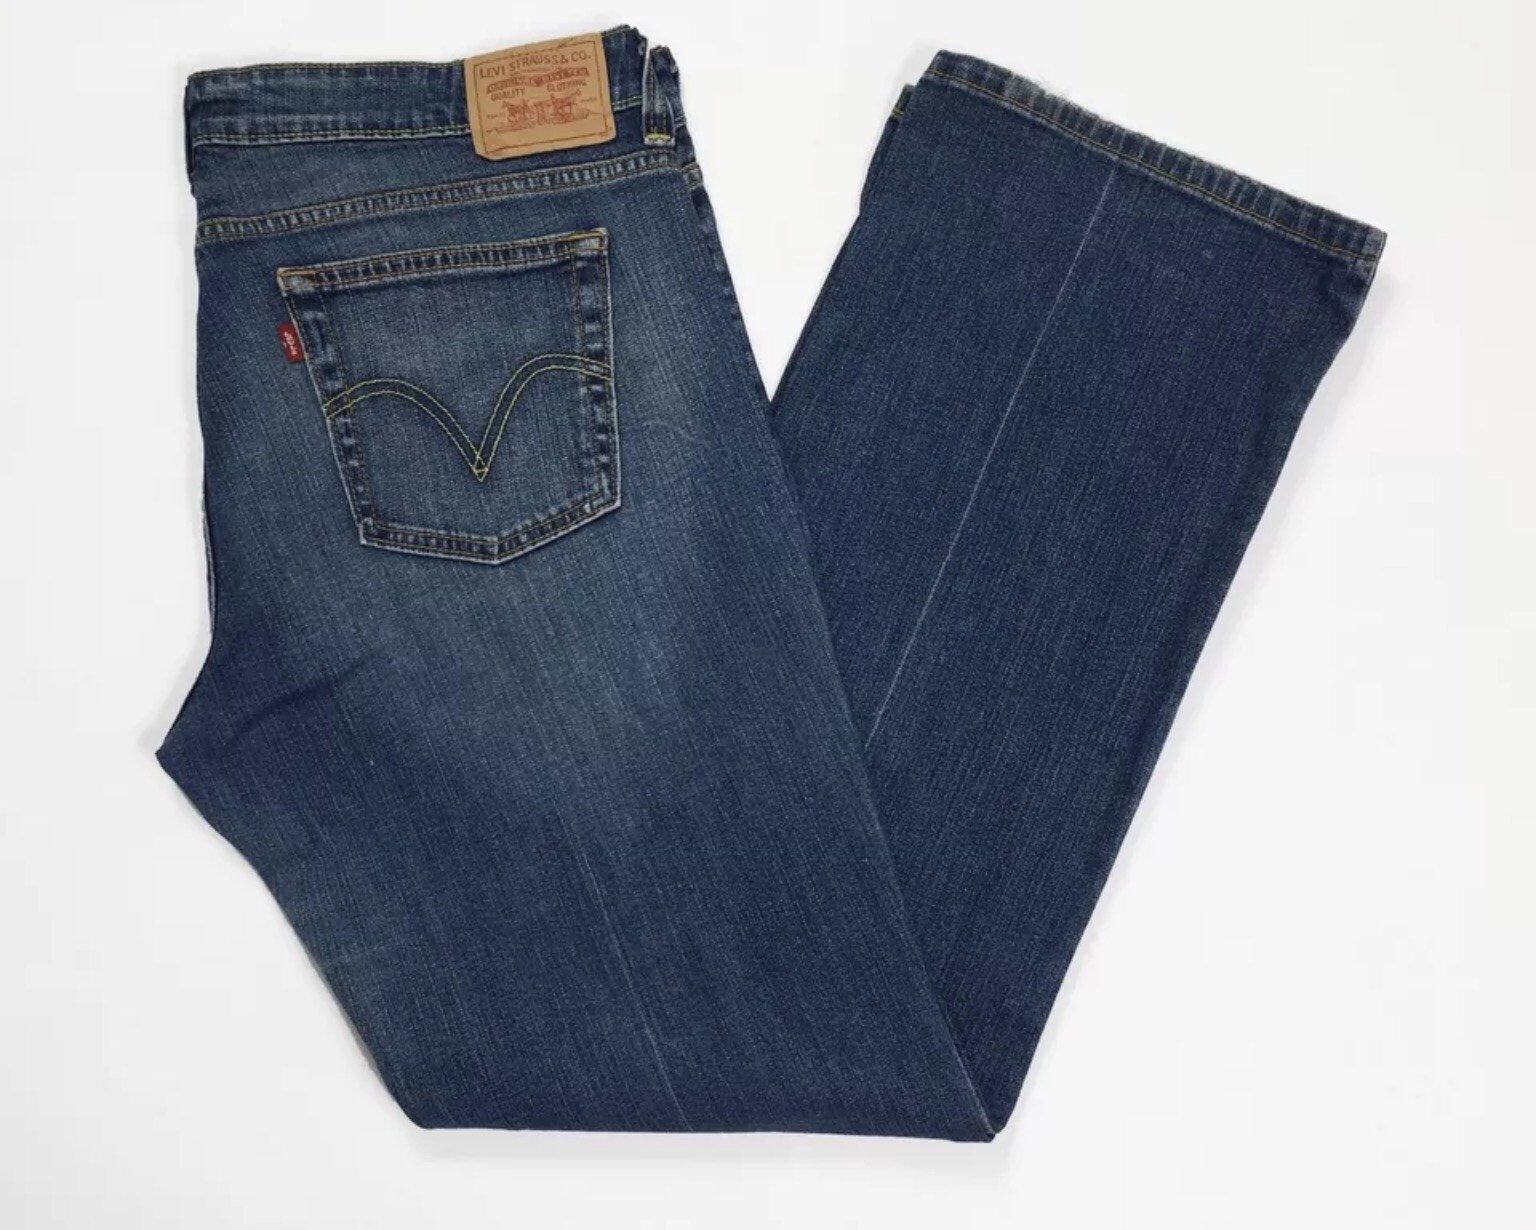 Paladino jeans pantalone velluto a coste usato uomo w40 tg